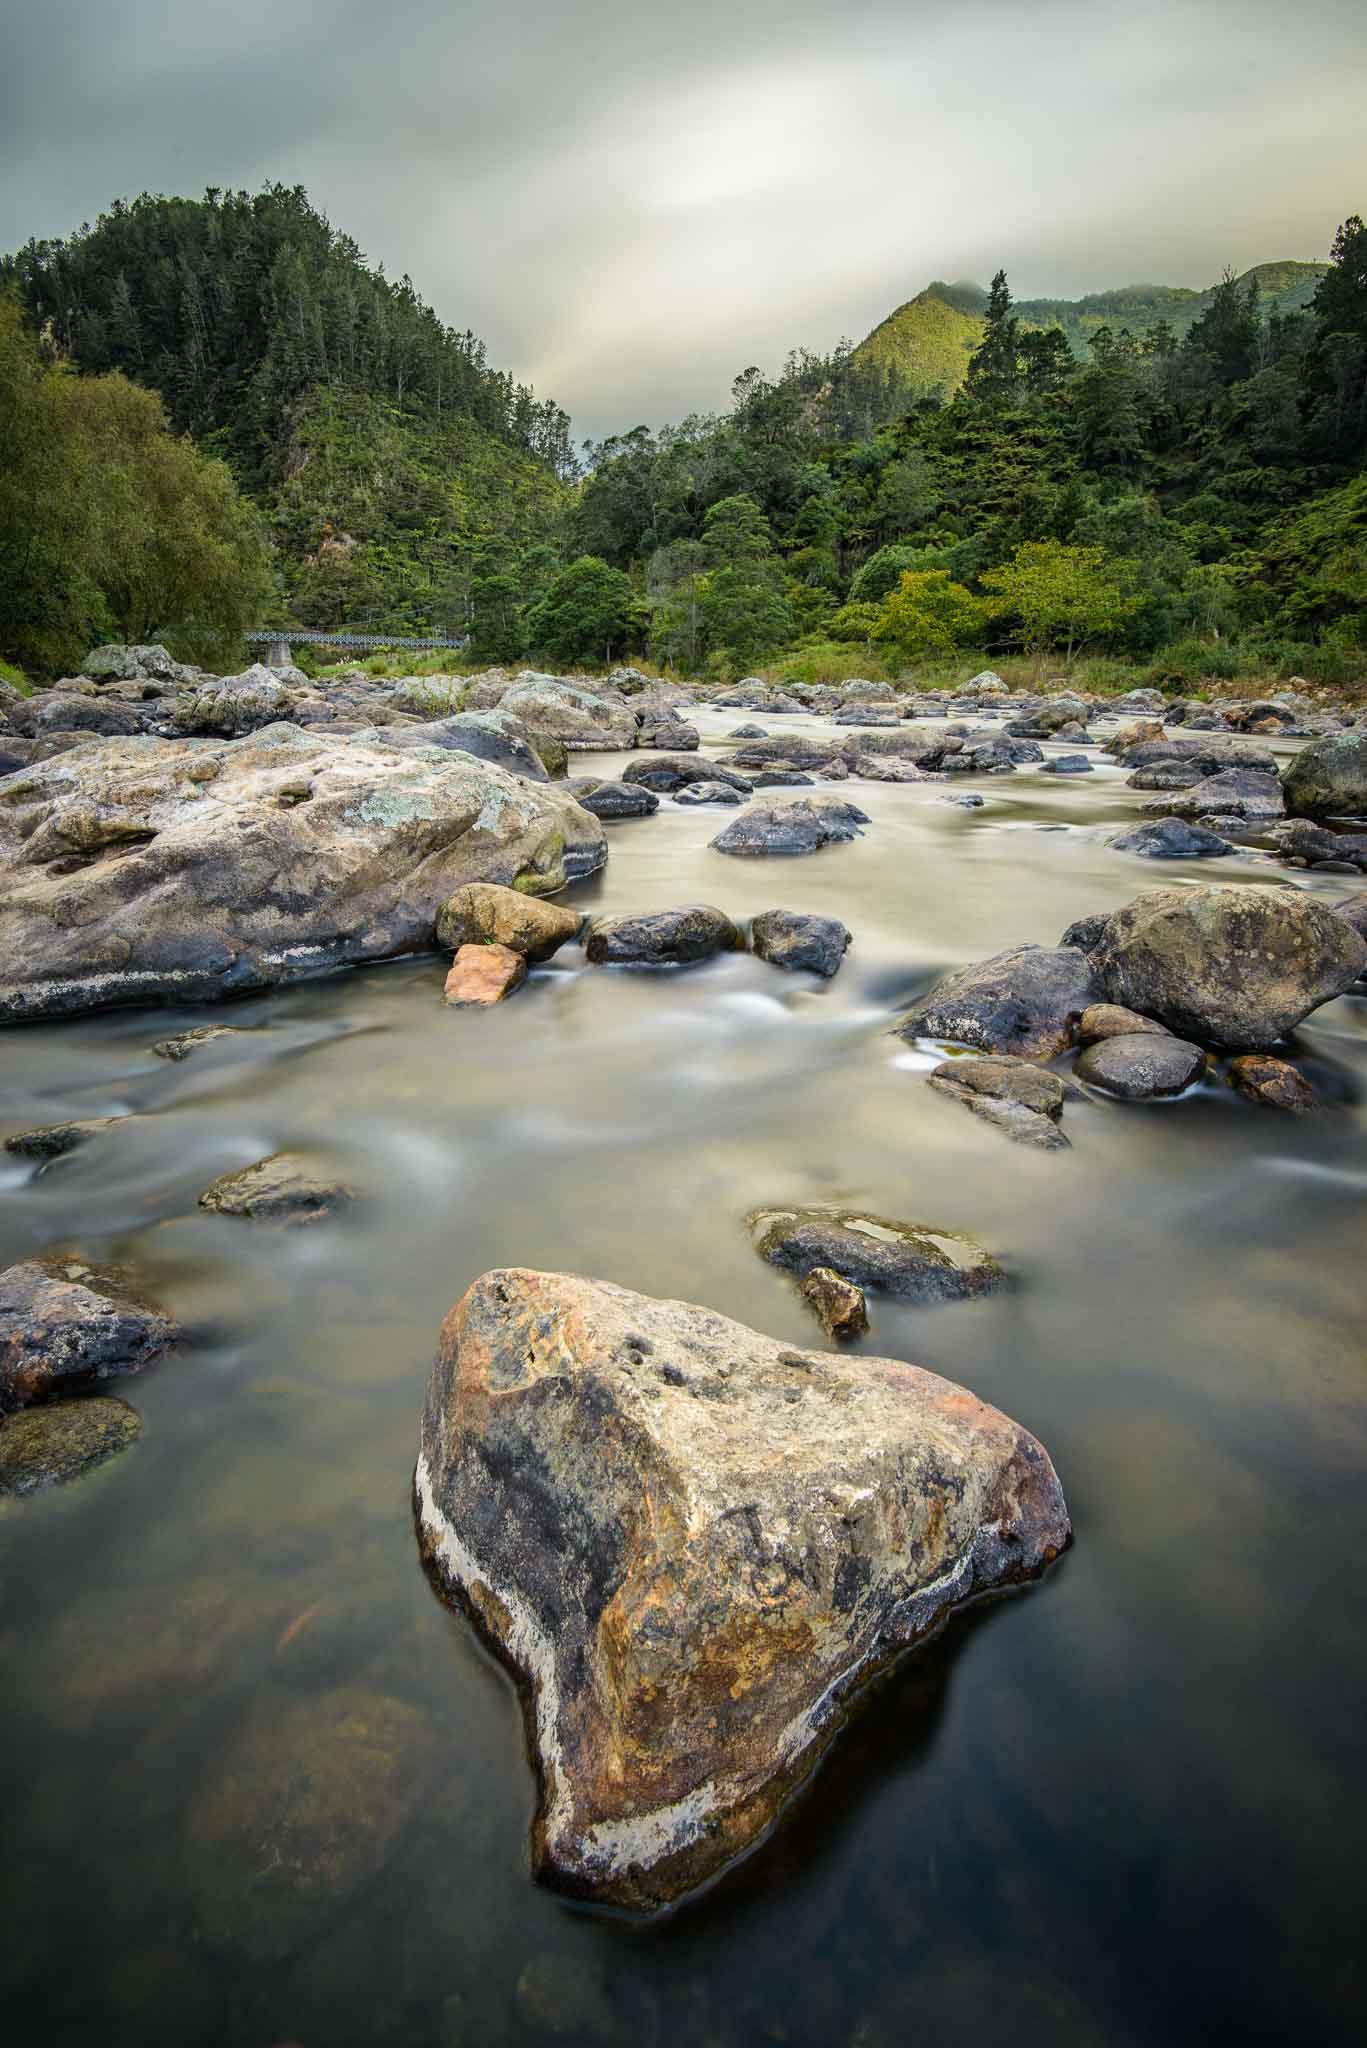 Landscape photo Ohinemuri River Karangahake Gorge coromandel New Zealand.